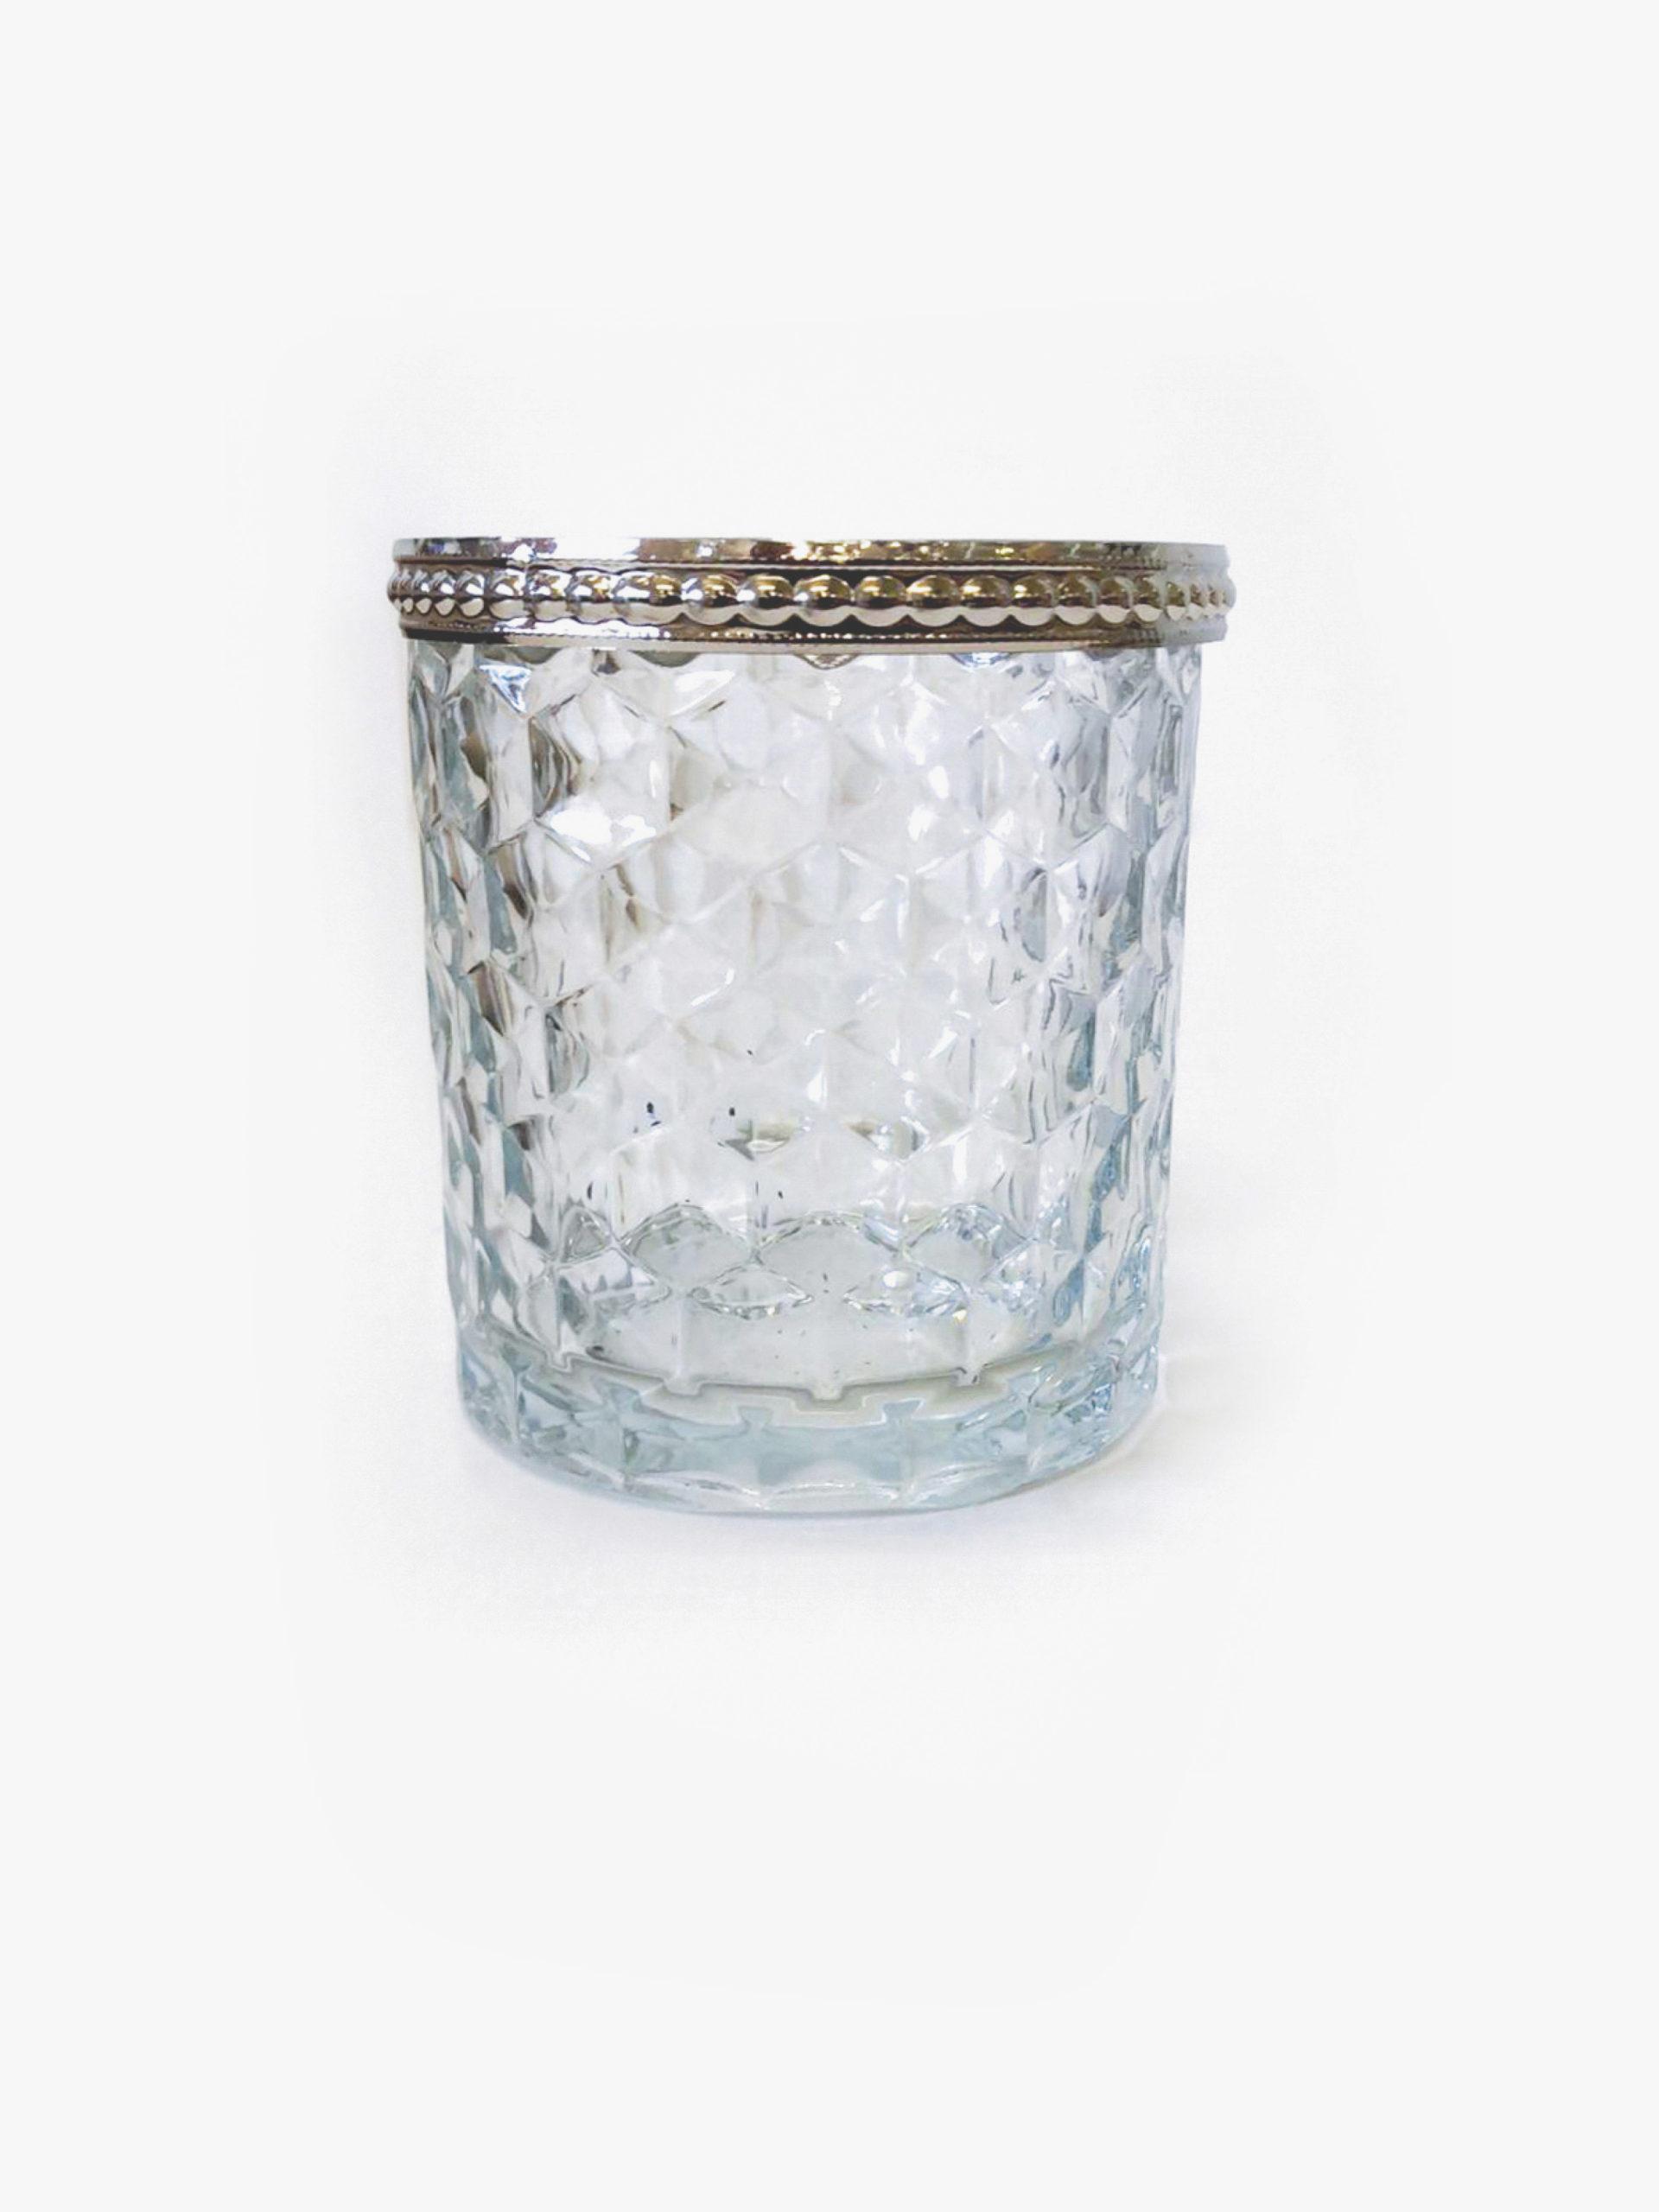 Hélène Millot - Glass and Silver